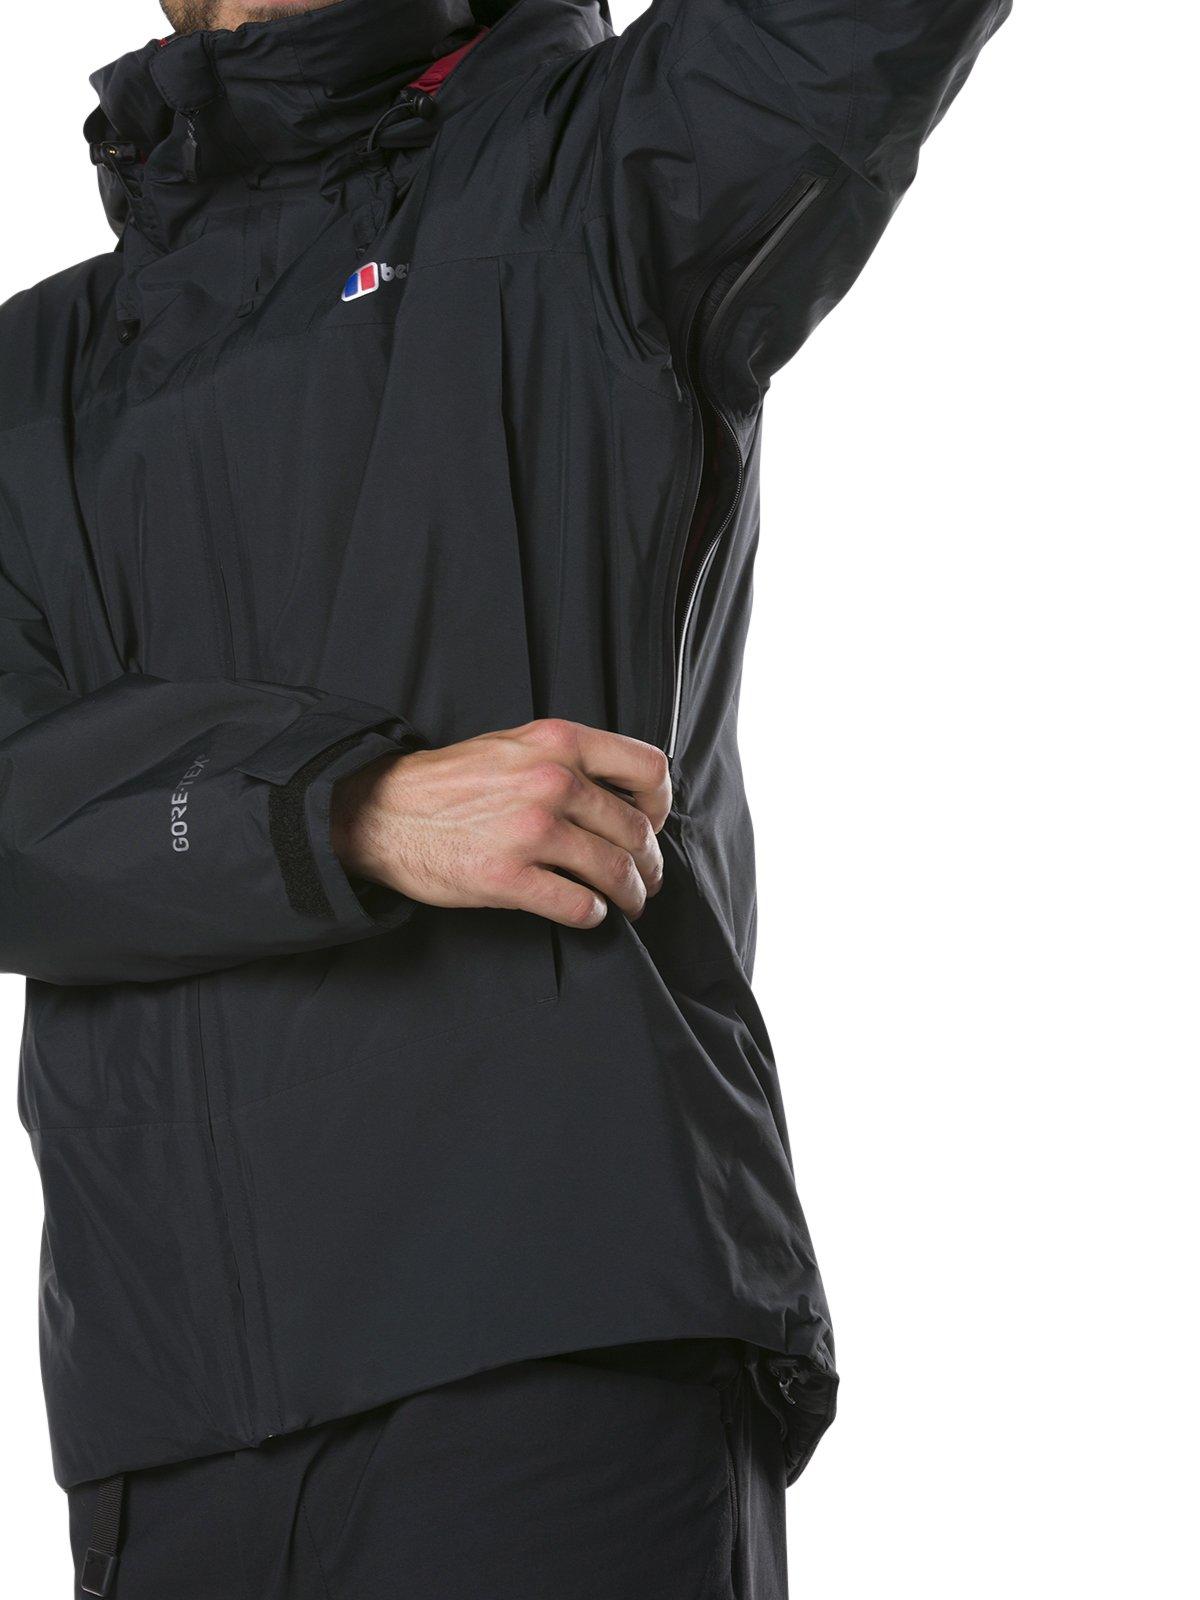 71Wx6tBw9bL - Berghaus Men's Helionik Loft Gore-Tex Waterproof Jacket